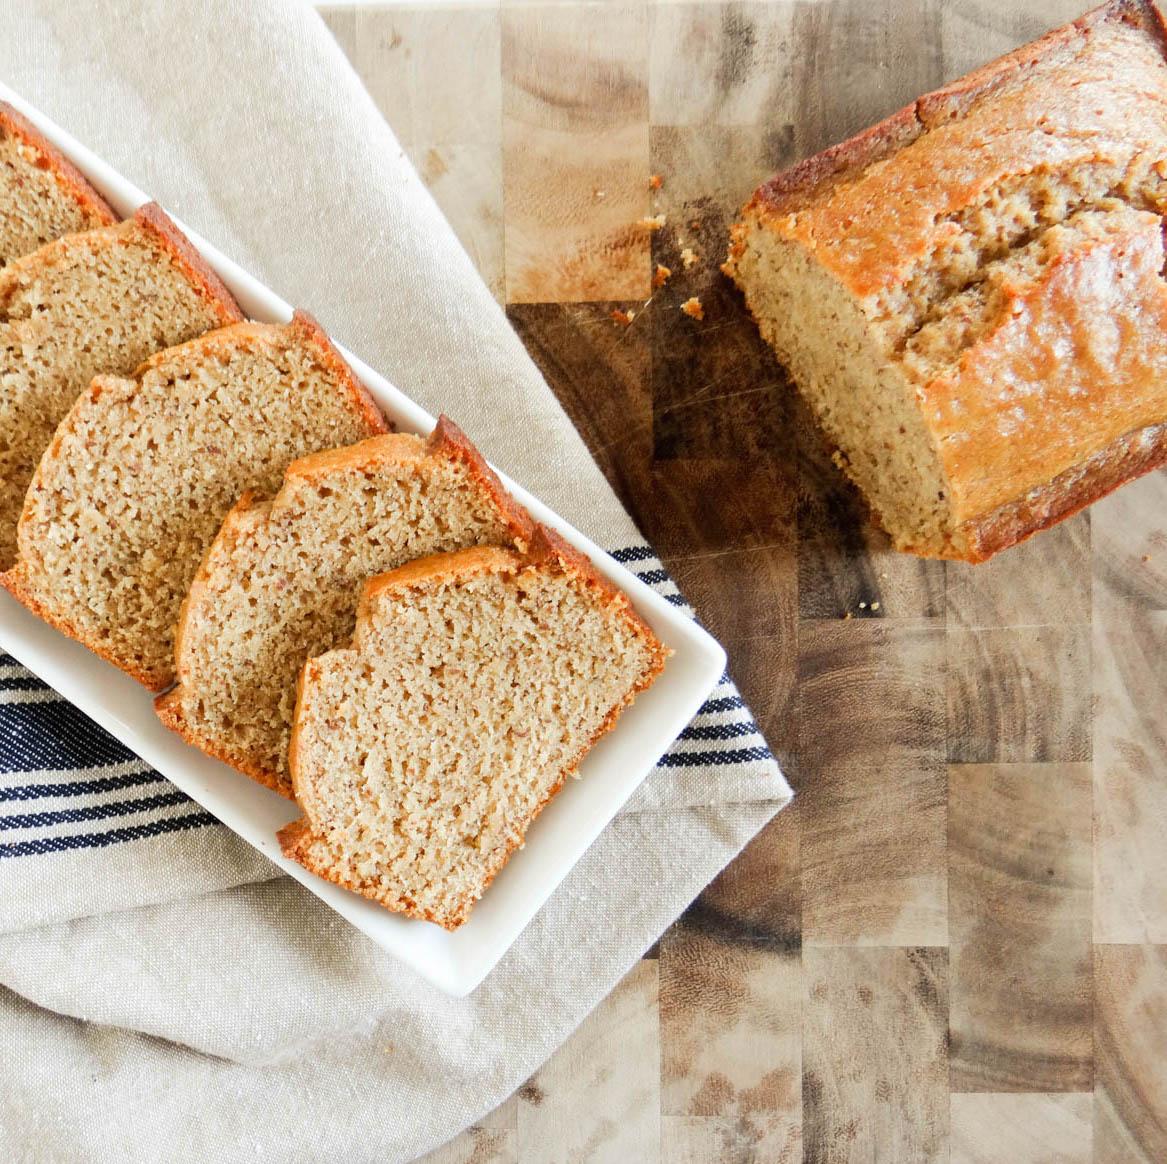 Creative Quick Breads - Day 2 {November 20, 2015}